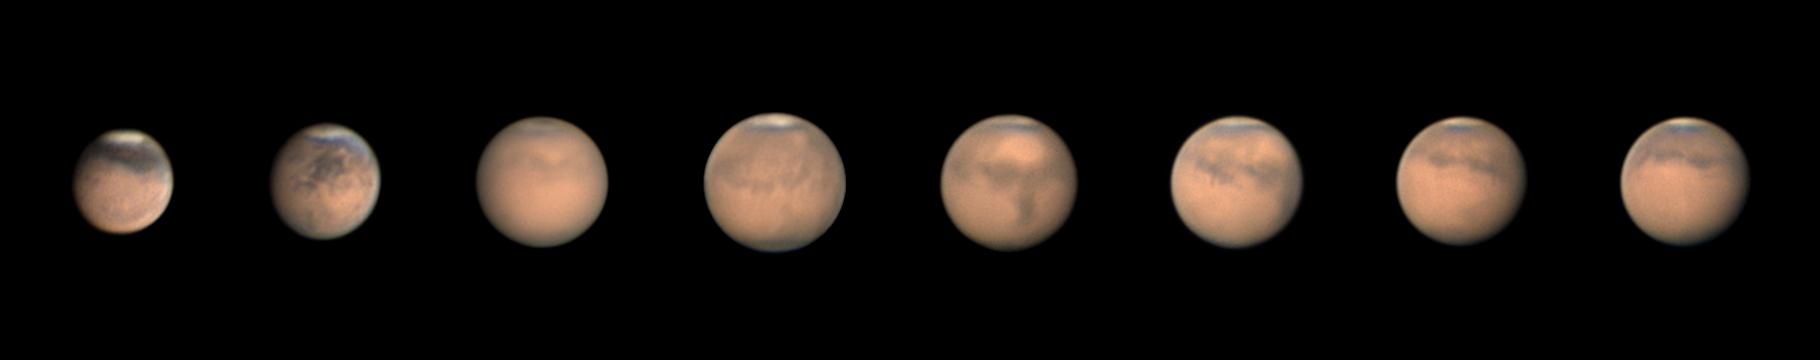 Mars (sorozat)